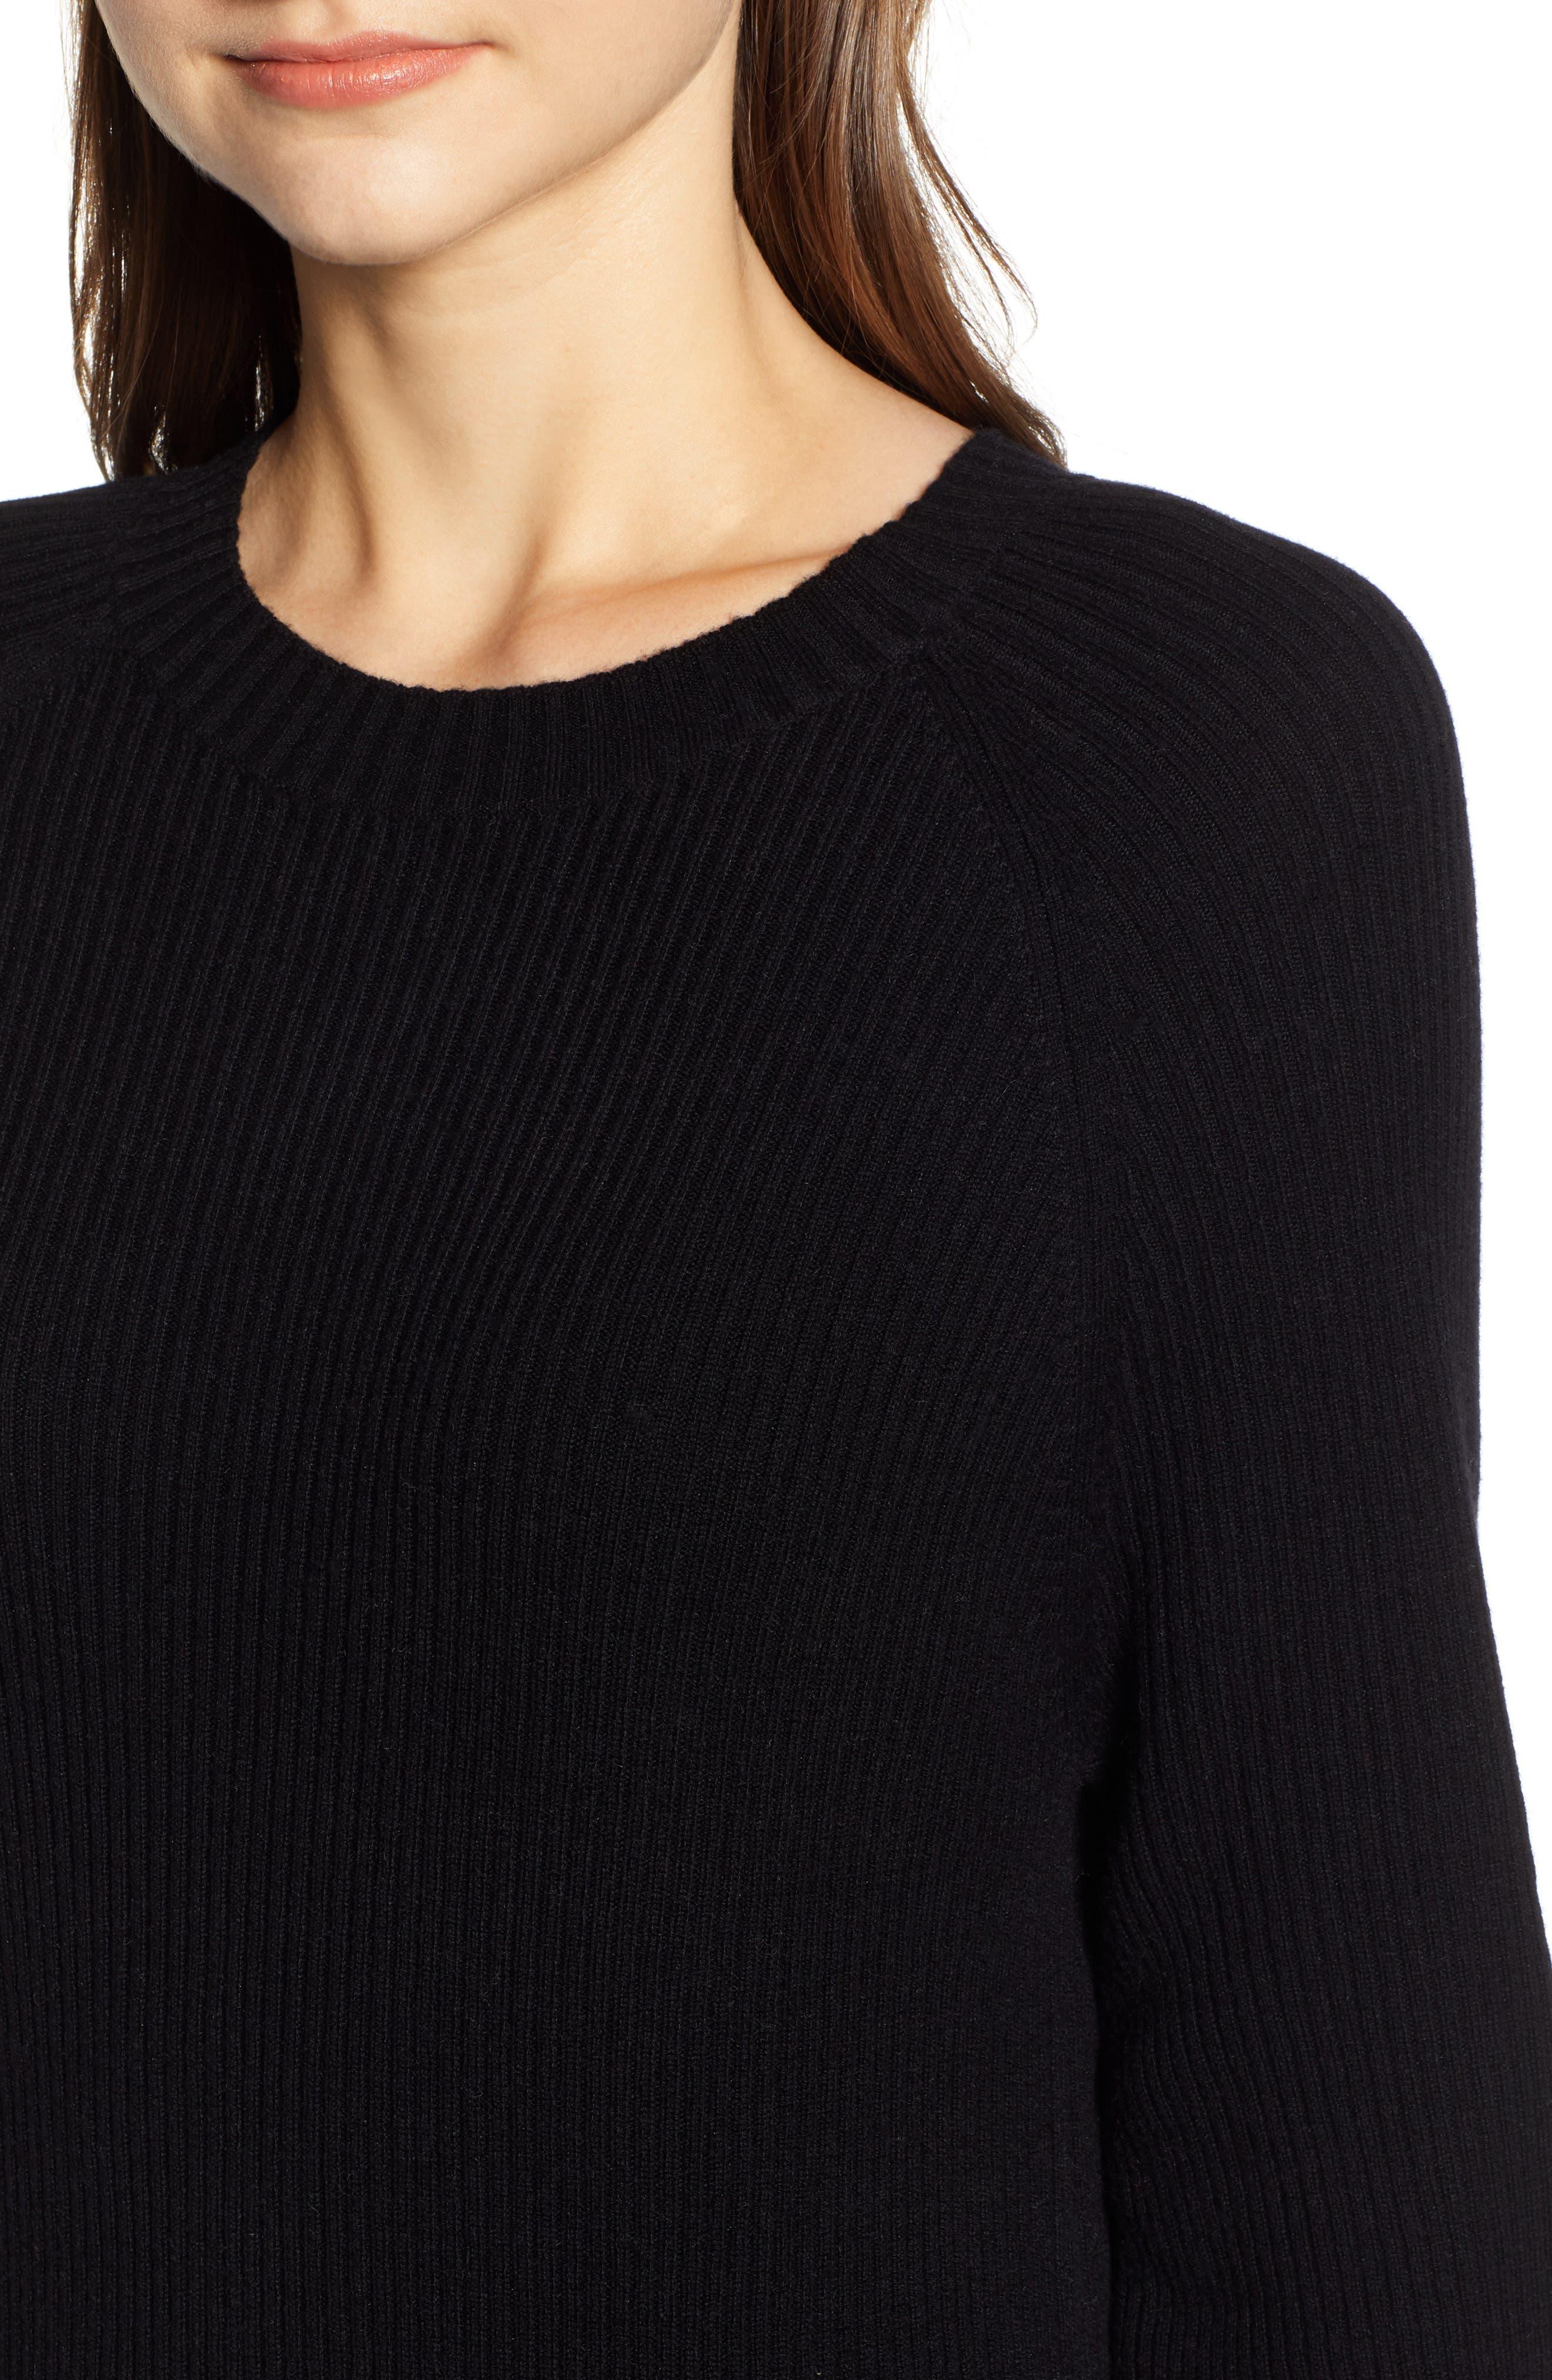 Quaid Knit Sweater Dress,                             Alternate thumbnail 4, color,                             TRUE BLACK